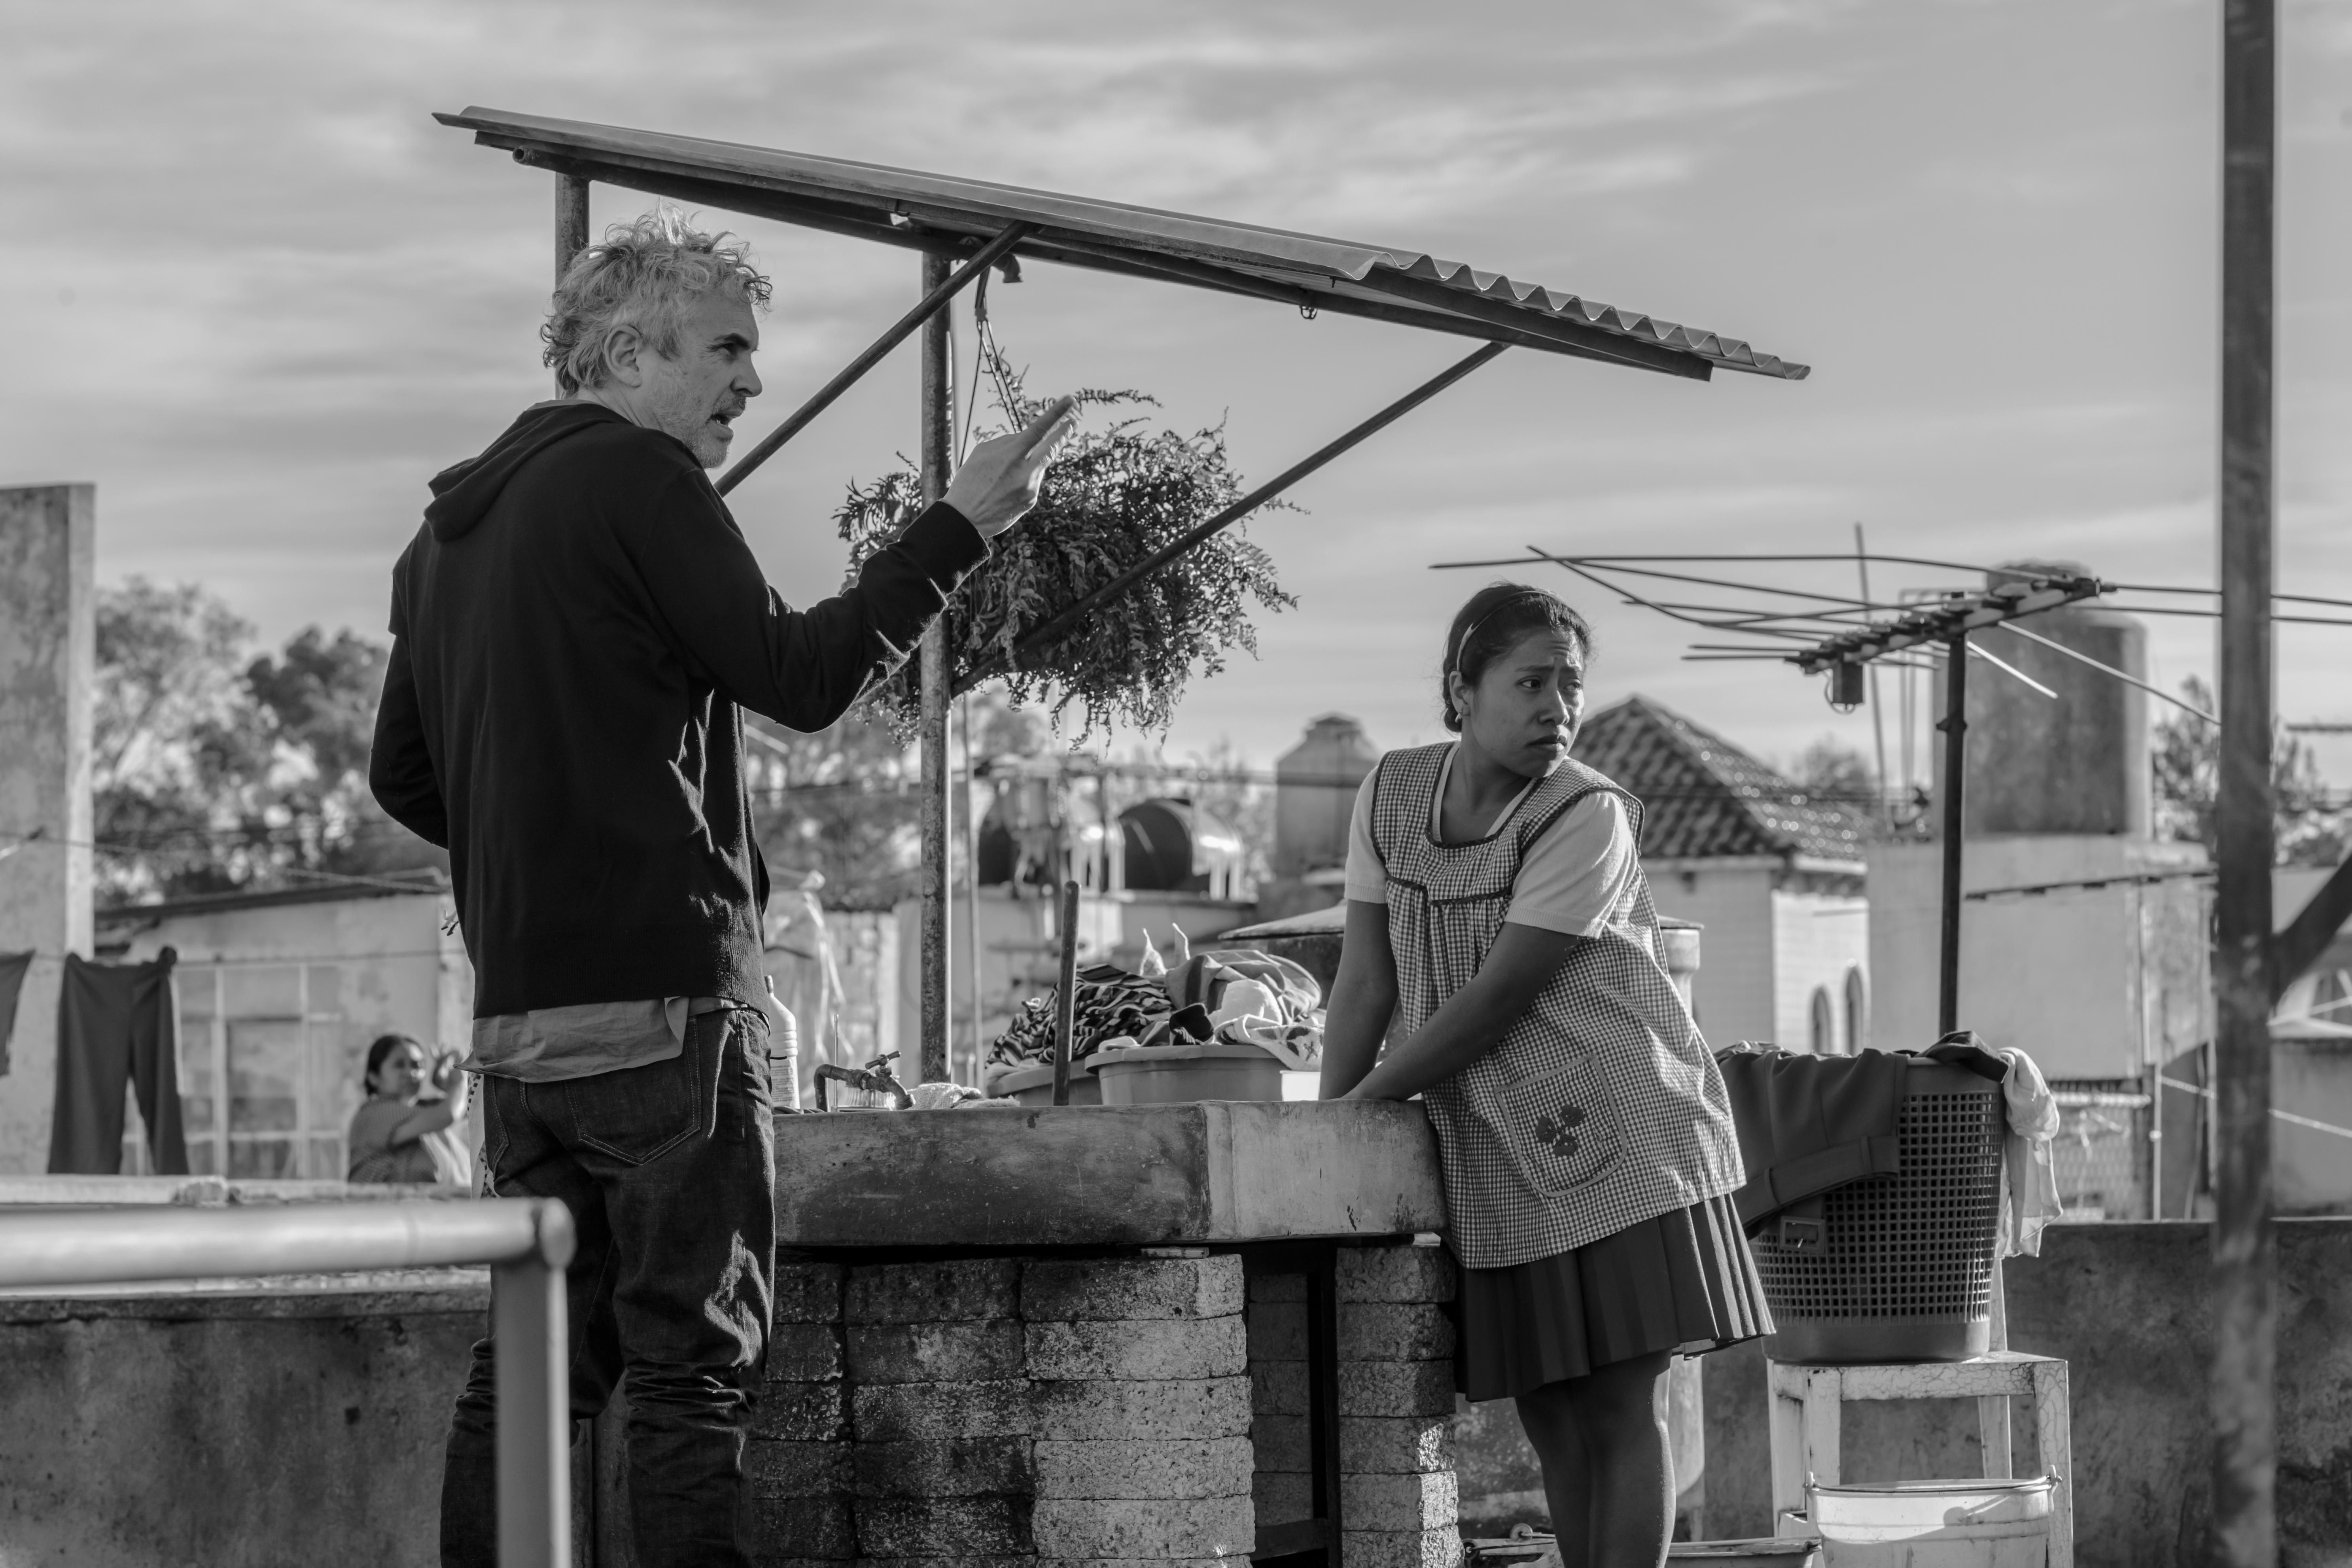 Alfonso Cuaron's Highly Anticipated Mexico-Set Movie 'Roma' Heads to New York